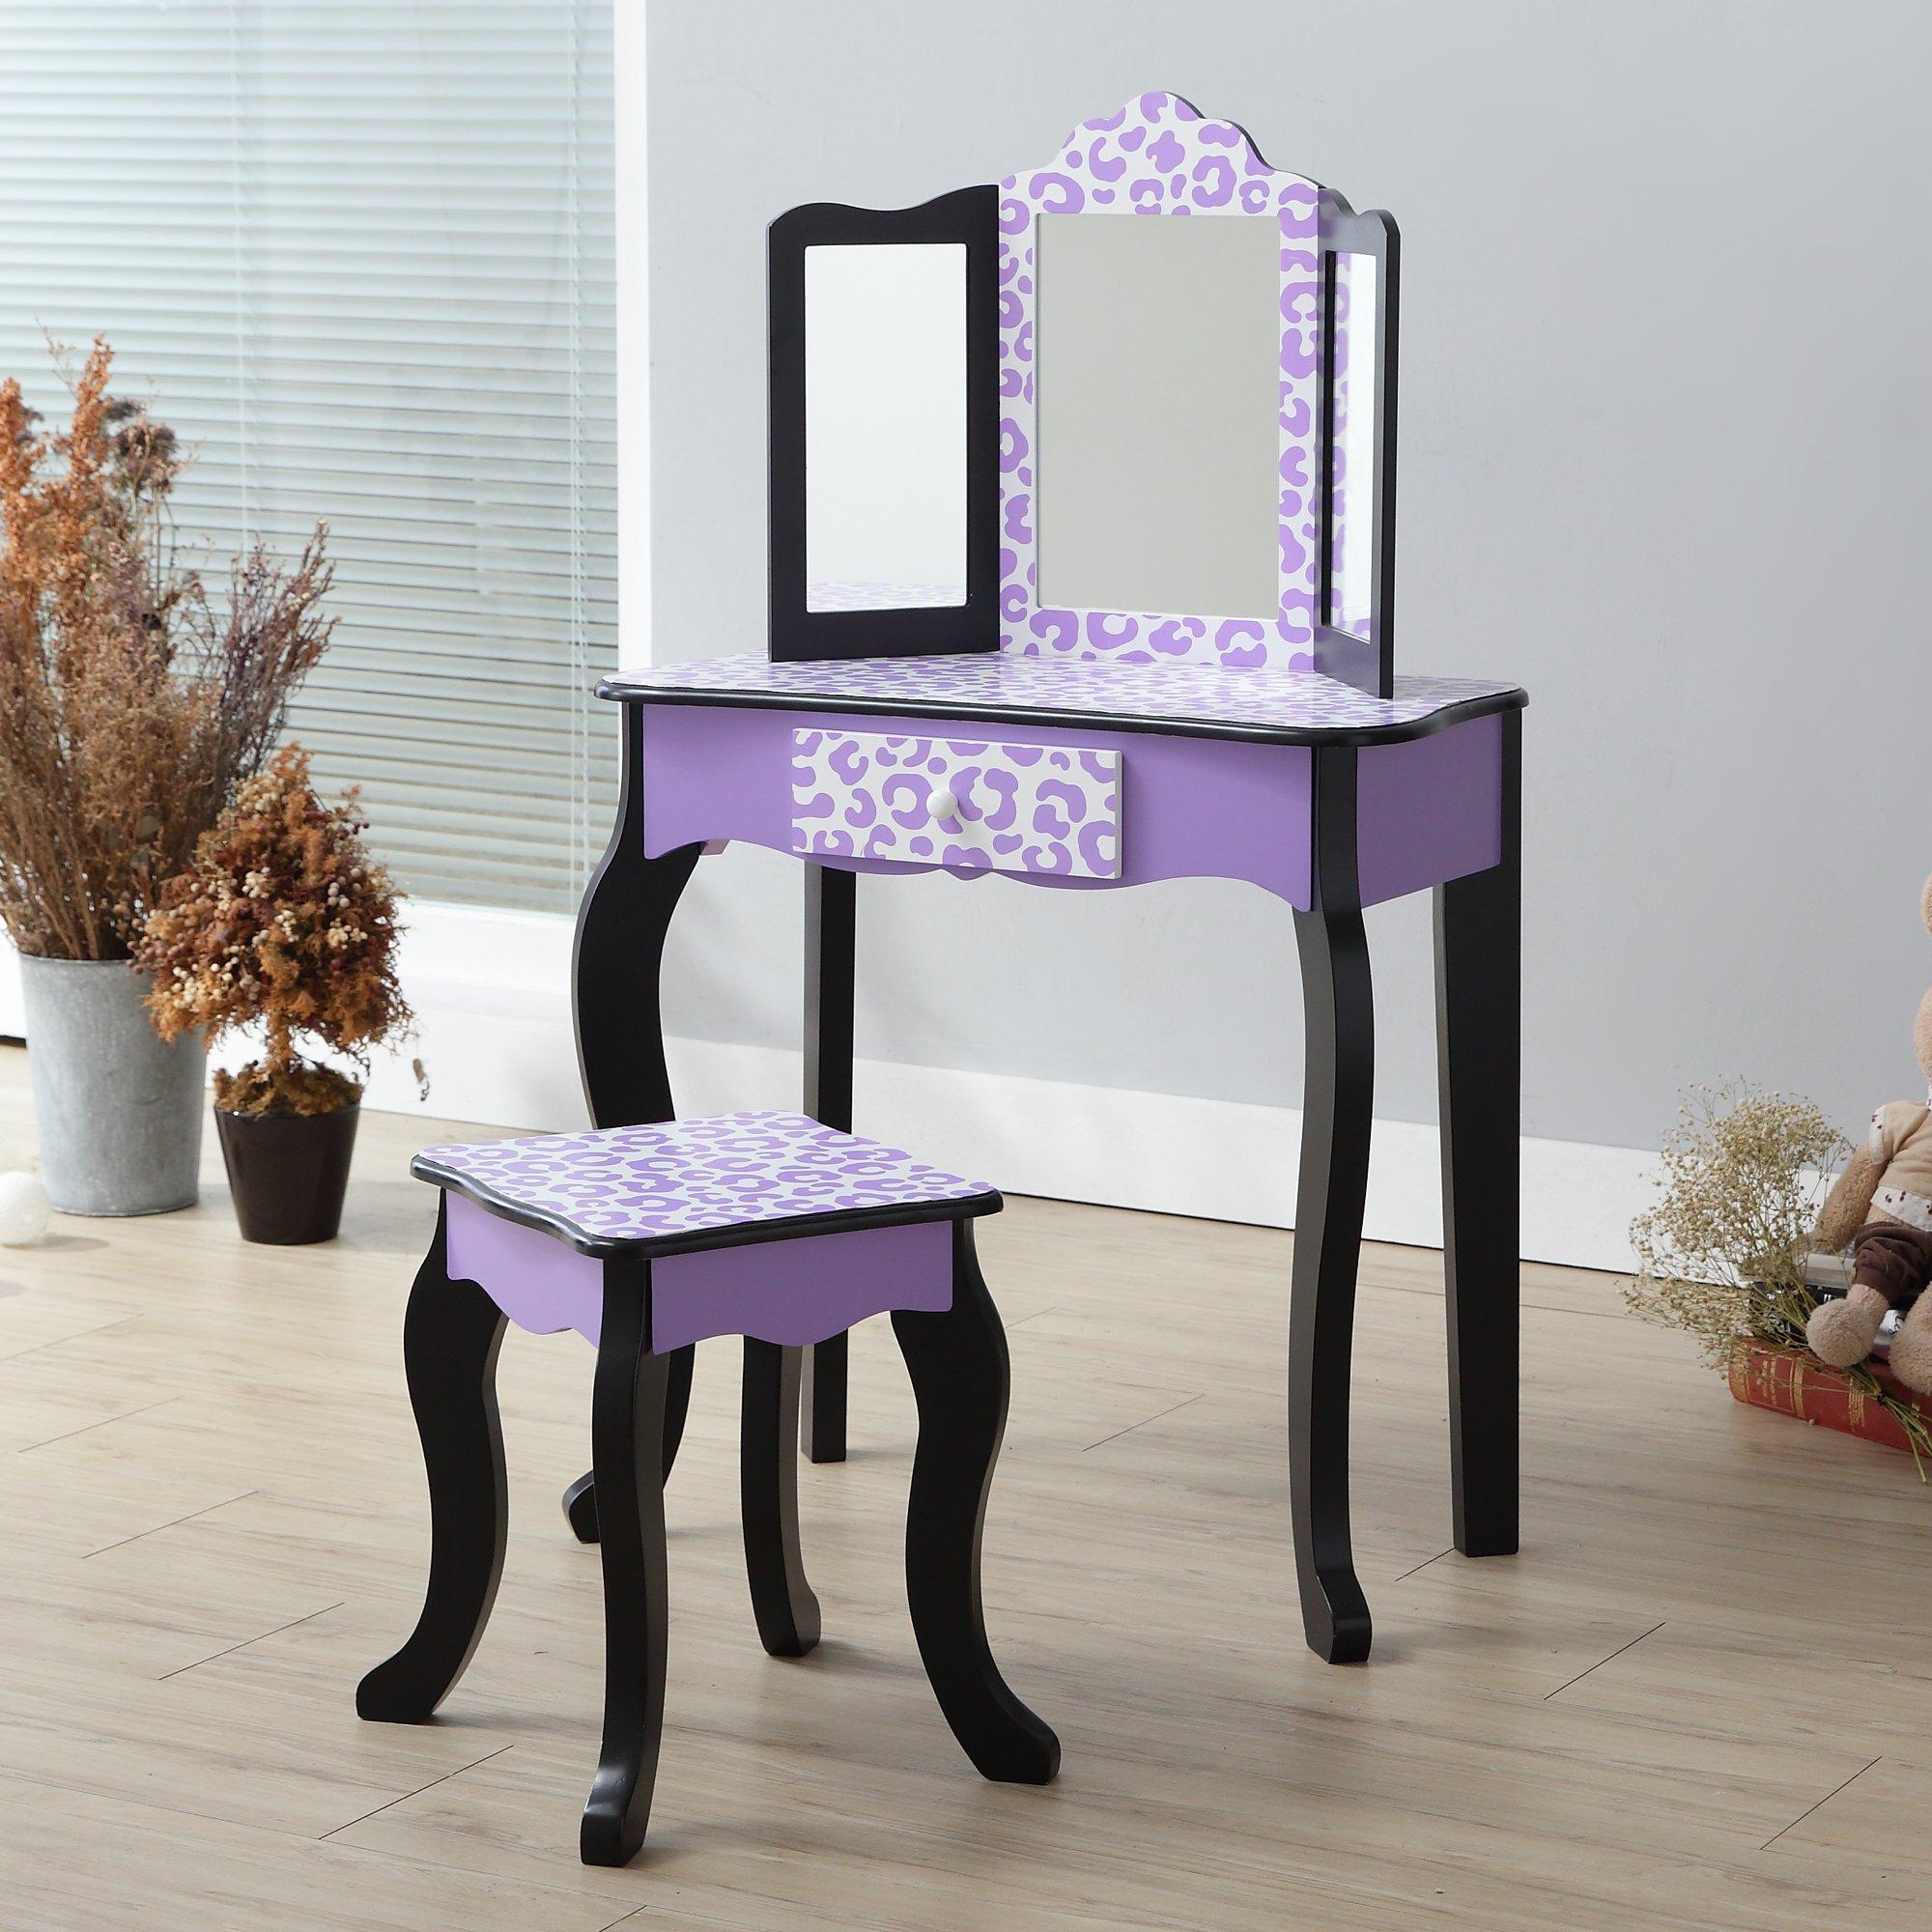 Teamson Kids Gisele Vanity Table & Stool Set, Purple/ Black by Teamson Kids